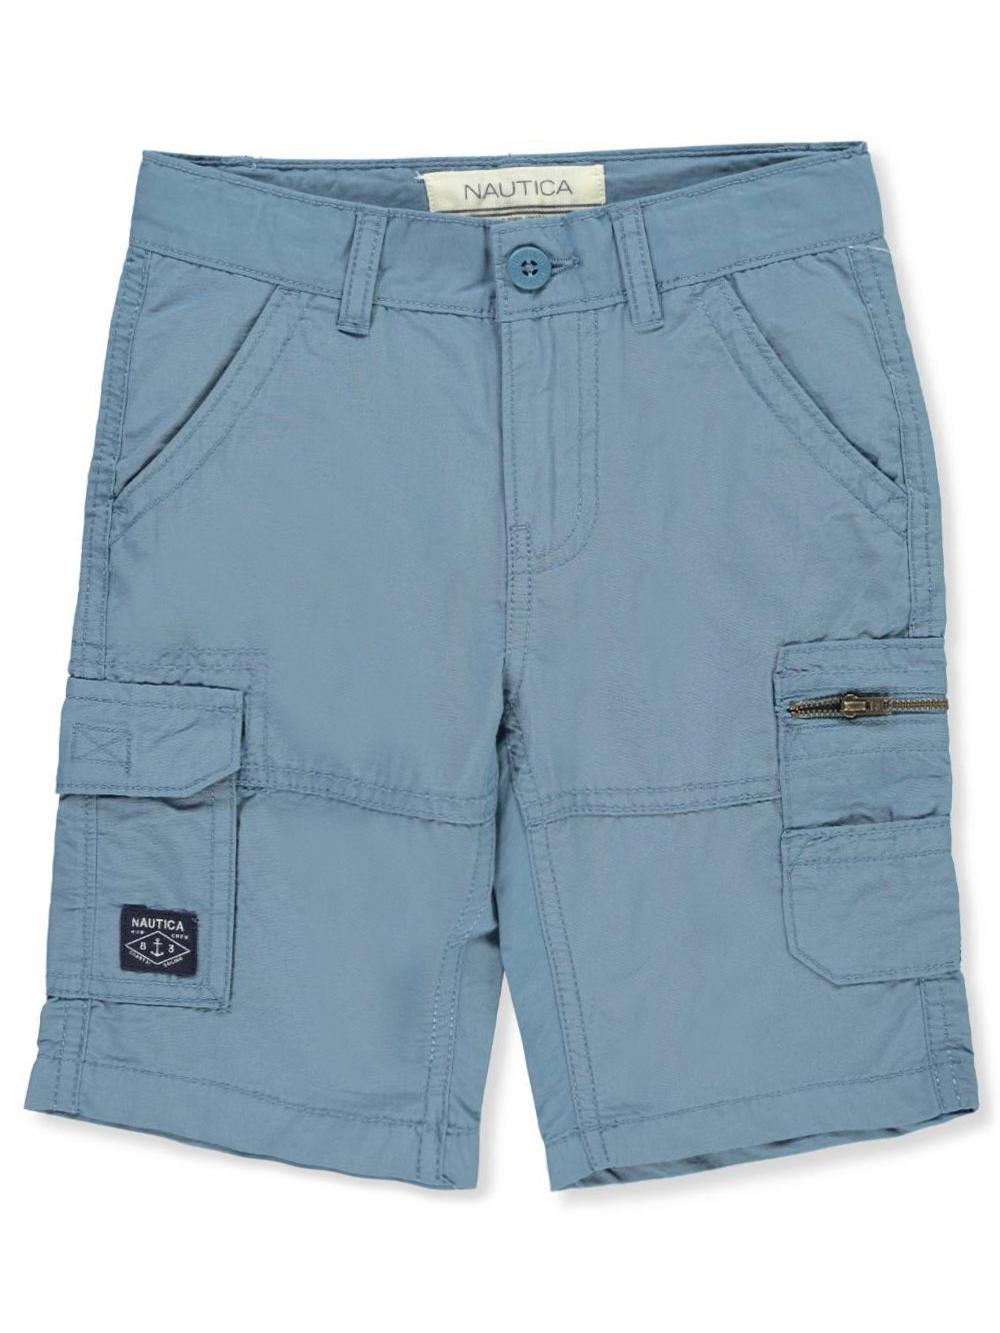 6177842b6 Nautica Boys' Cargo Shorts